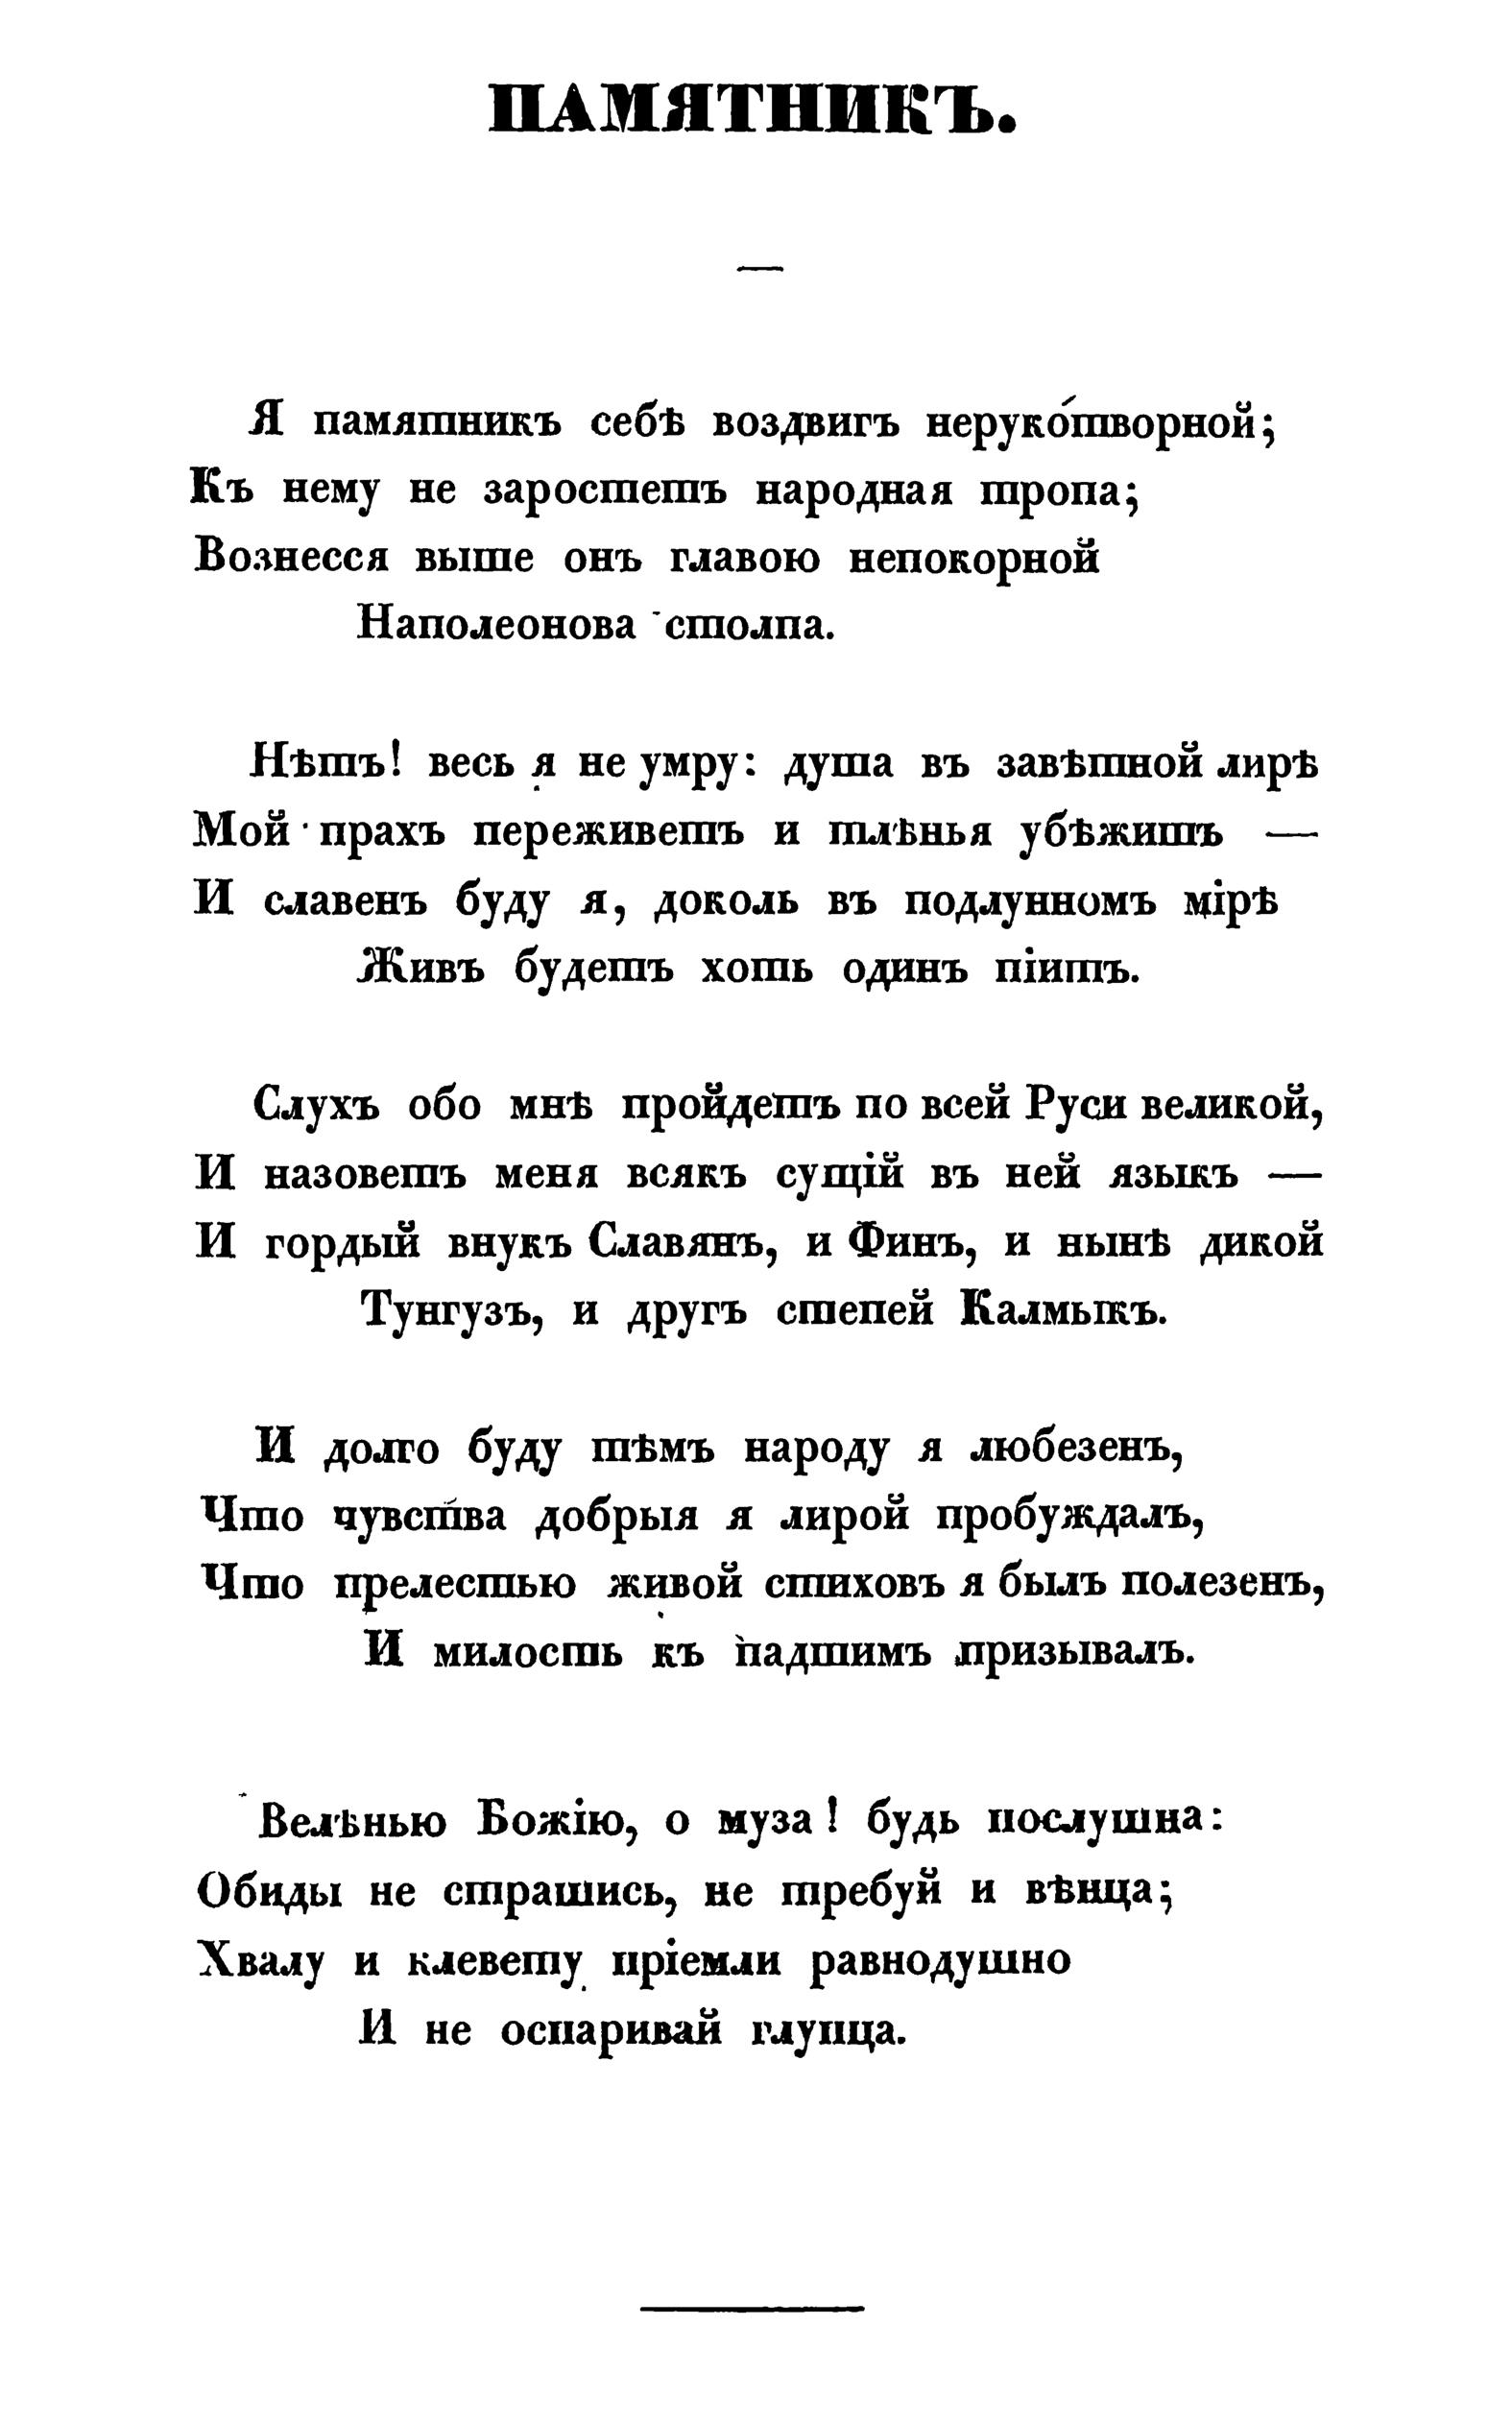 А.с пушкин стих памятник тема